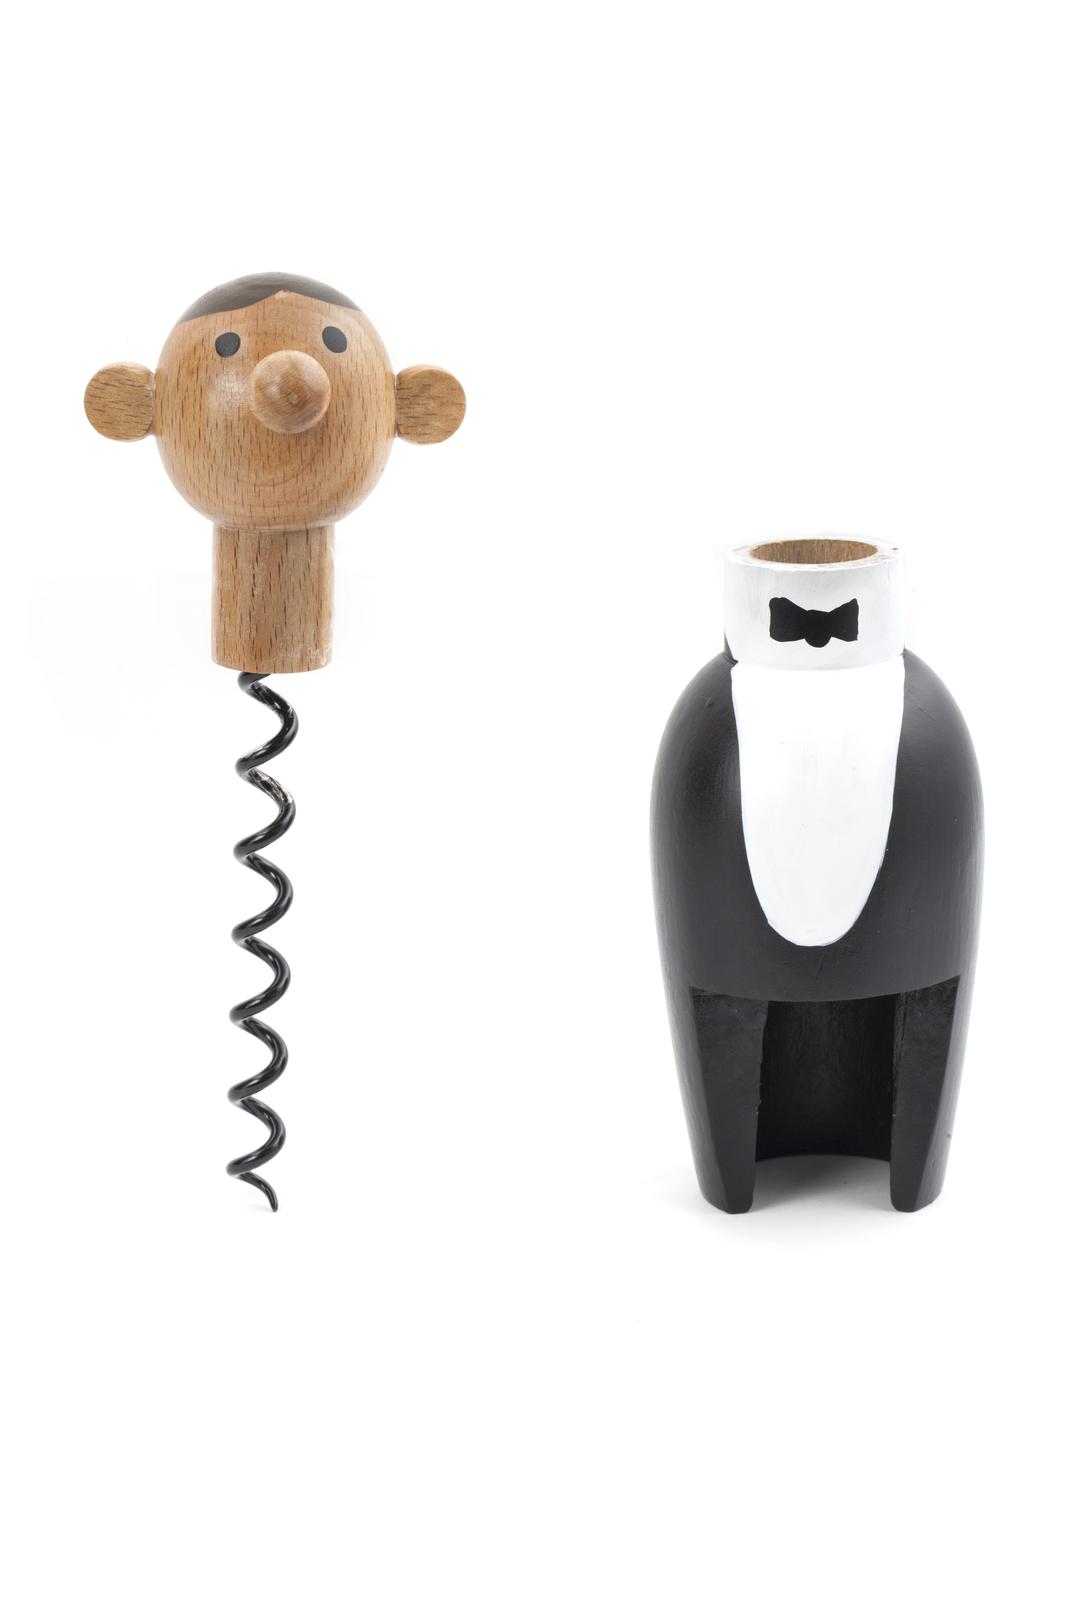 korkenzieher gentleman at your service corkscrew aus holz. Black Bedroom Furniture Sets. Home Design Ideas